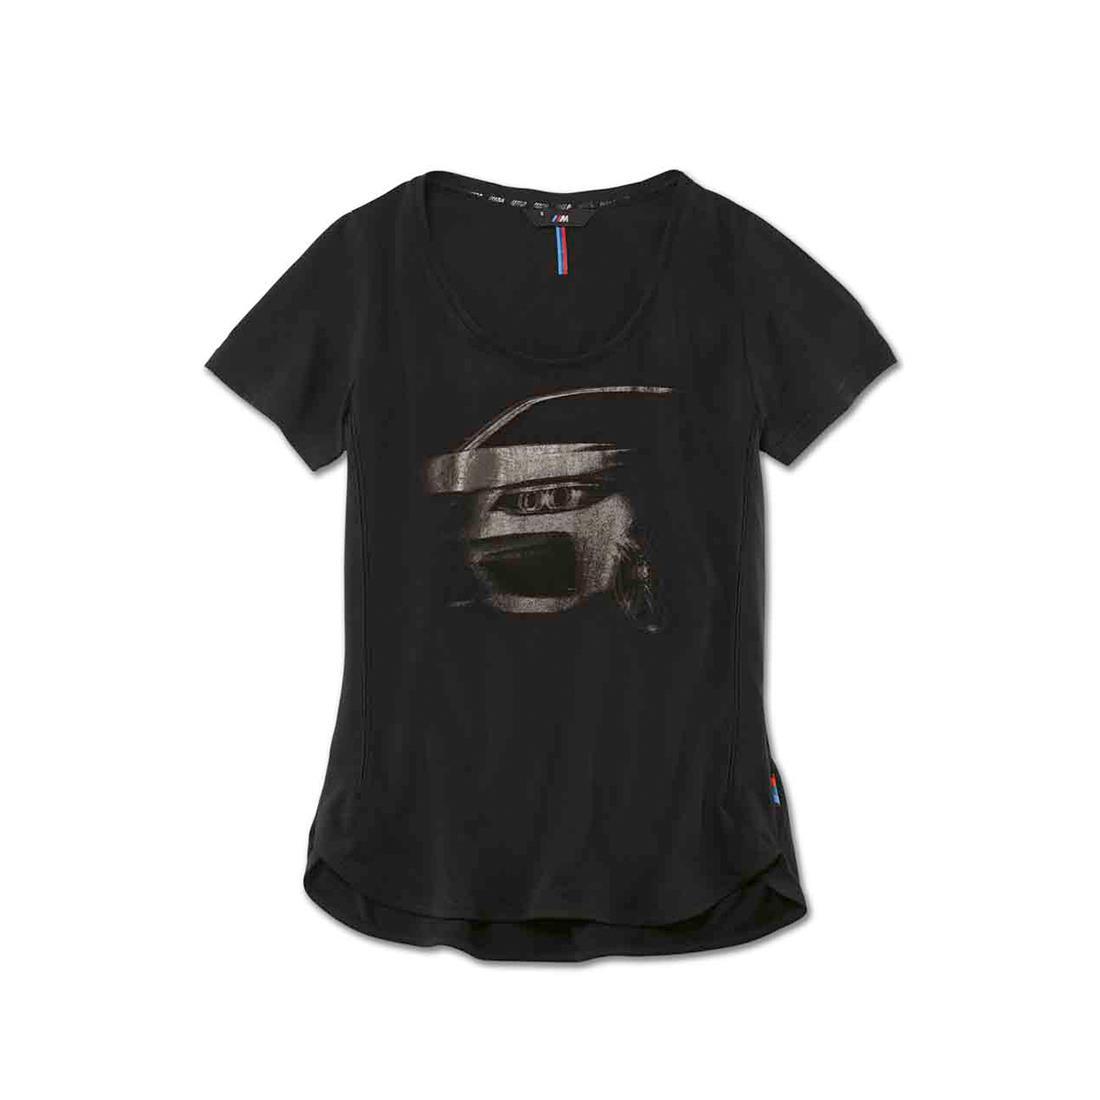 bmw m graphic t shirt women. Black Bedroom Furniture Sets. Home Design Ideas